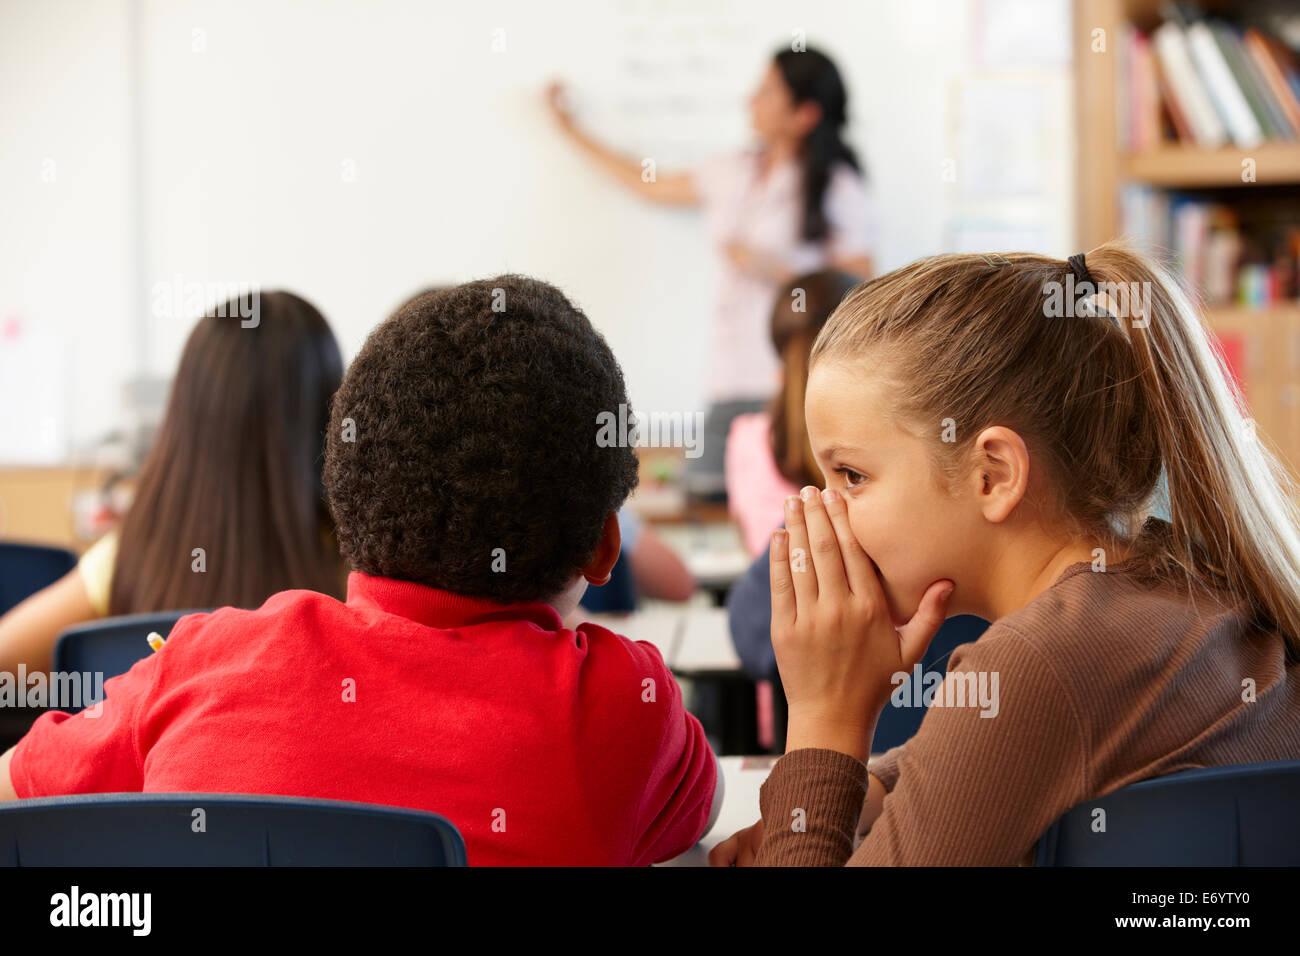 Schoolchildren whispering in class - Stock Image